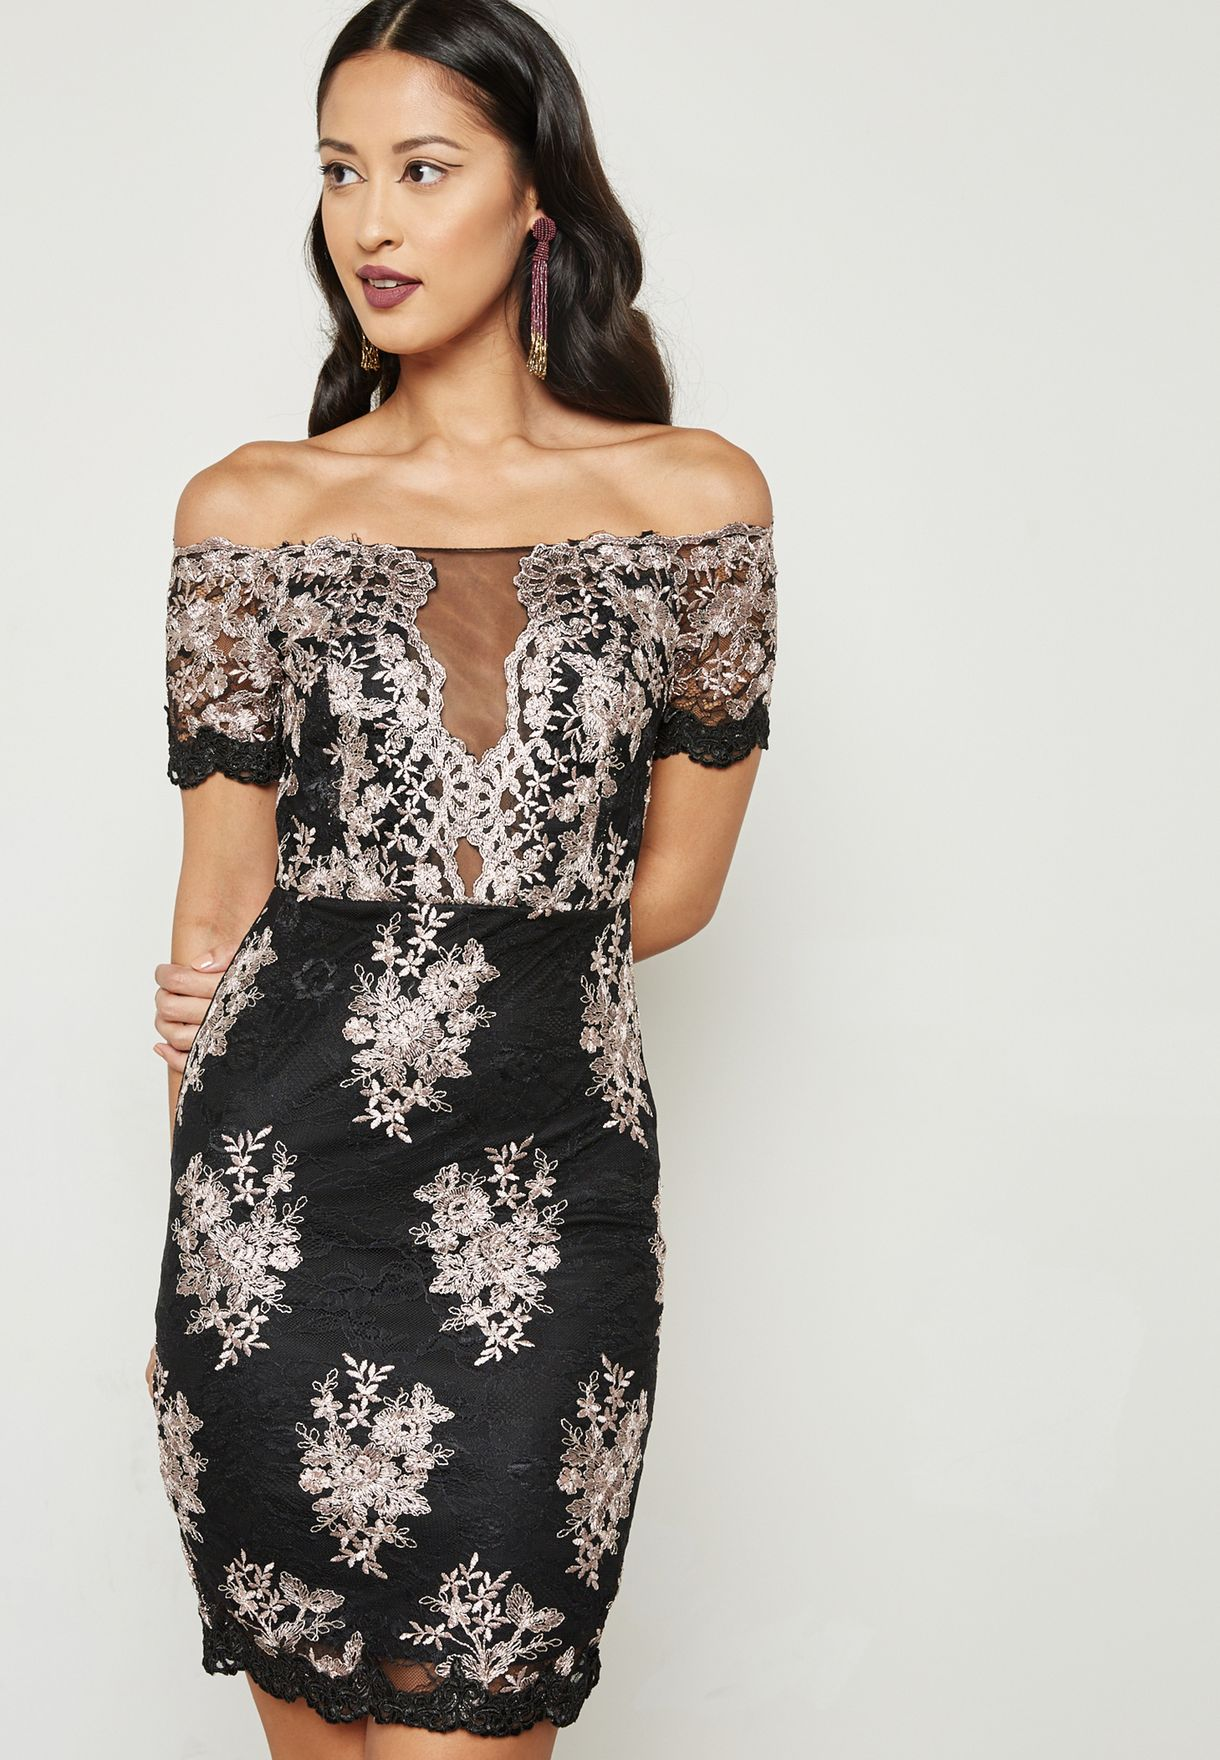 902019e7f5ccc8 Shop Soieblu black Lace Illusion Bardot Dress S17110A86 for Women in ...